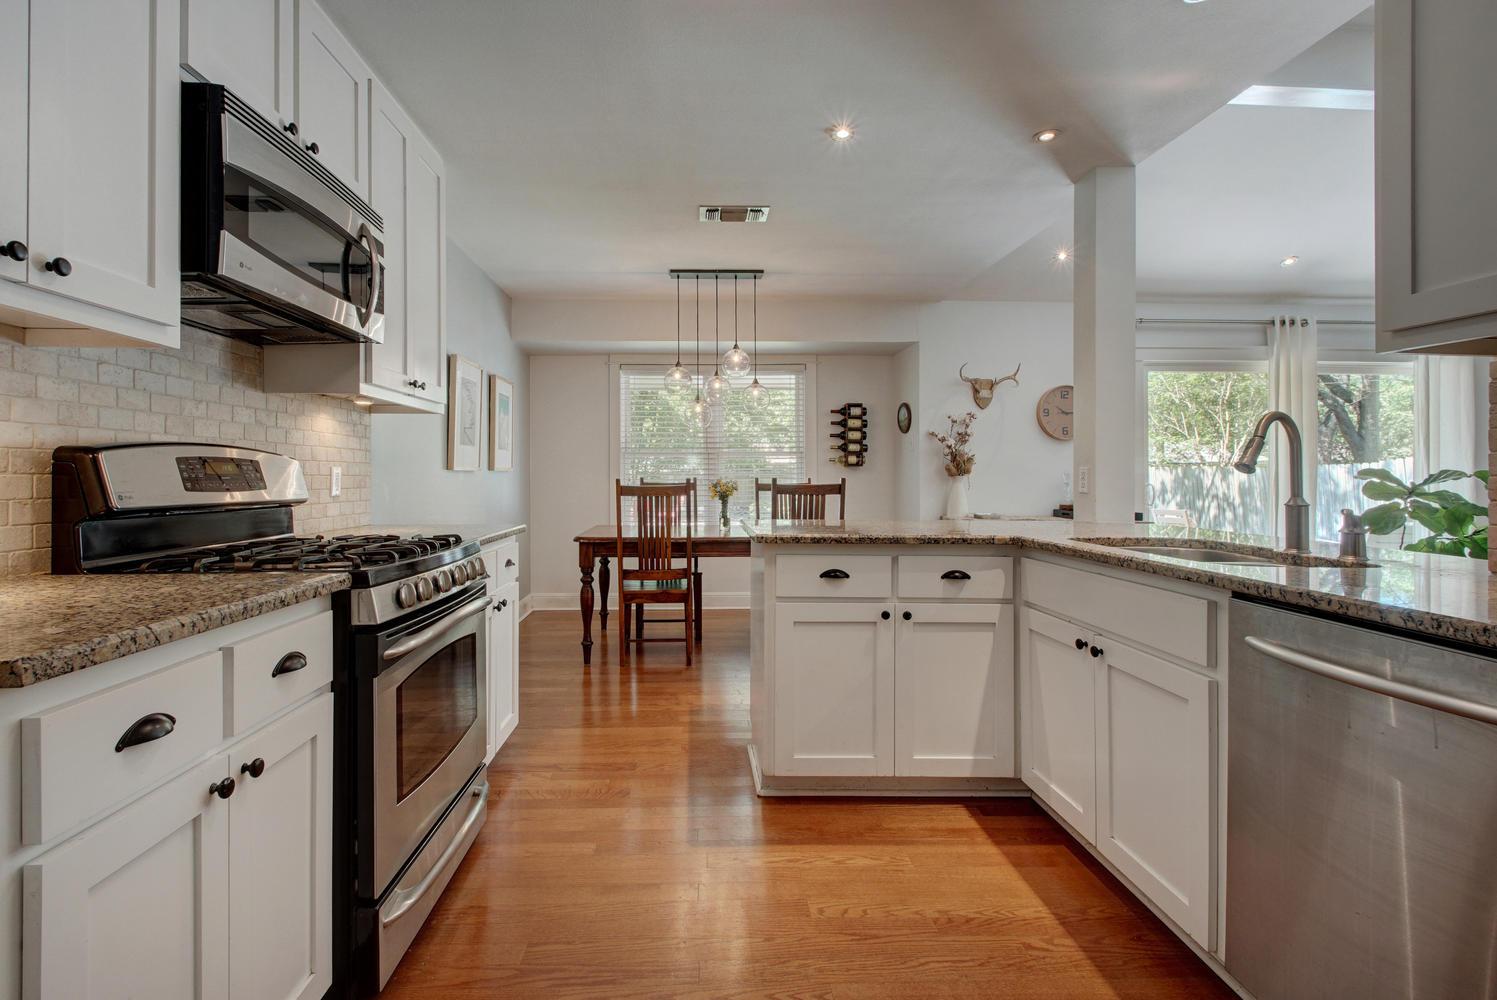 3201 Whitepine Dr-large-015-Family Kitchen Dining 462-1498x1000-72dpi.jpg